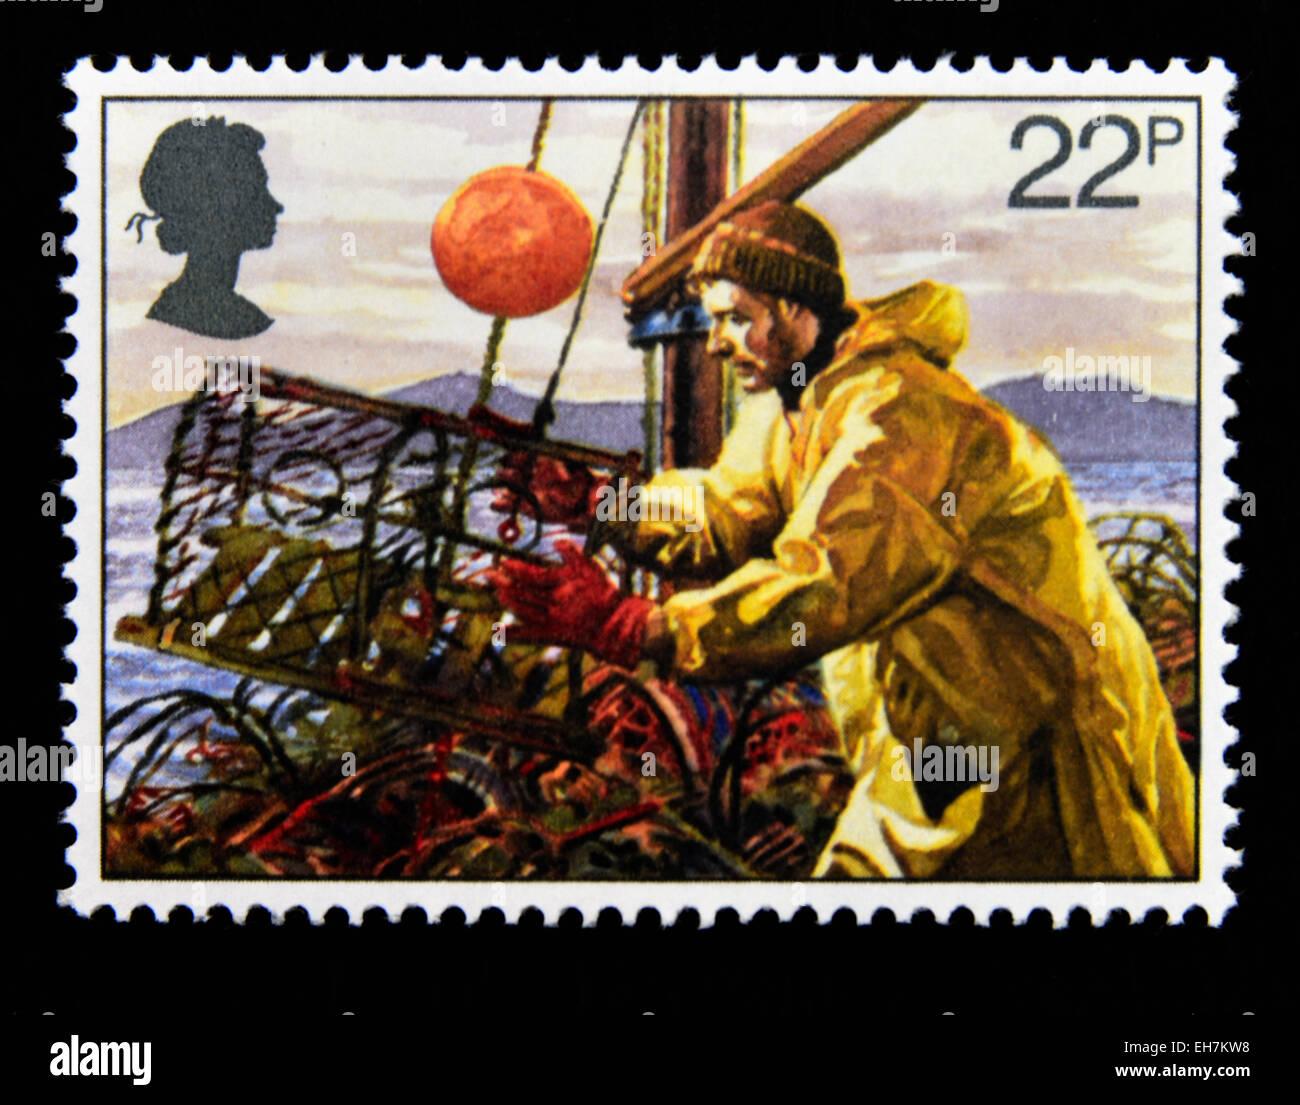 Postage stamp. Great Britain. Queen Elizabeth II. 1981. Fishing Industry. Lobster Potting. 22p. - Stock Image